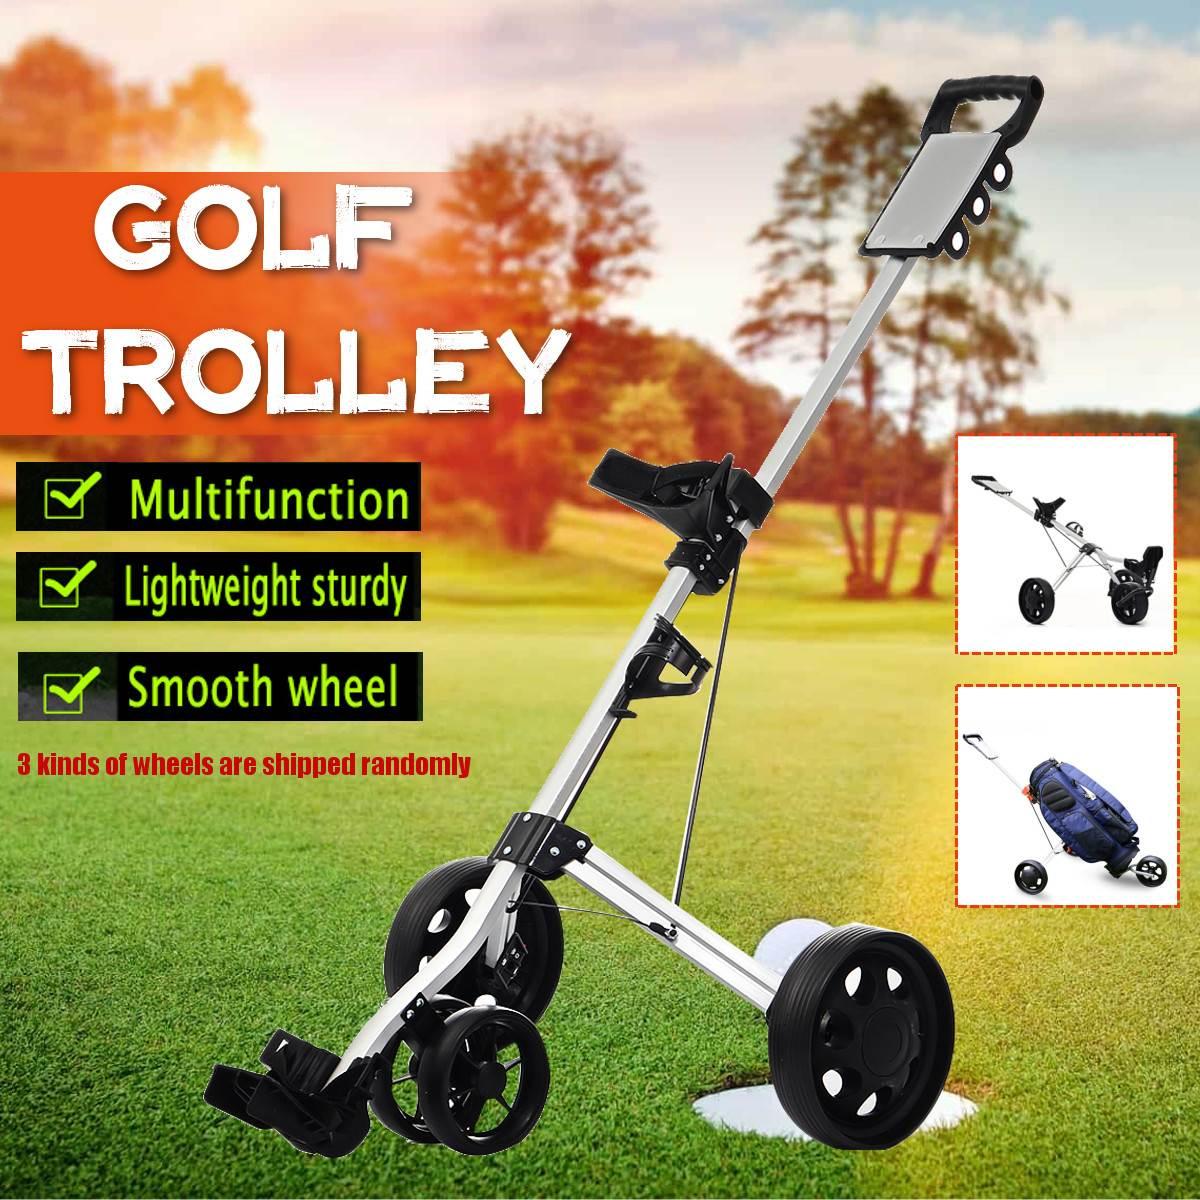 Golf Pull Cart Iron Black Adjustable Golf Trolley Cart 3/4Wheels Push Pull Golf Cart Aluminium Alloy Foldable Trolley With Brake 1